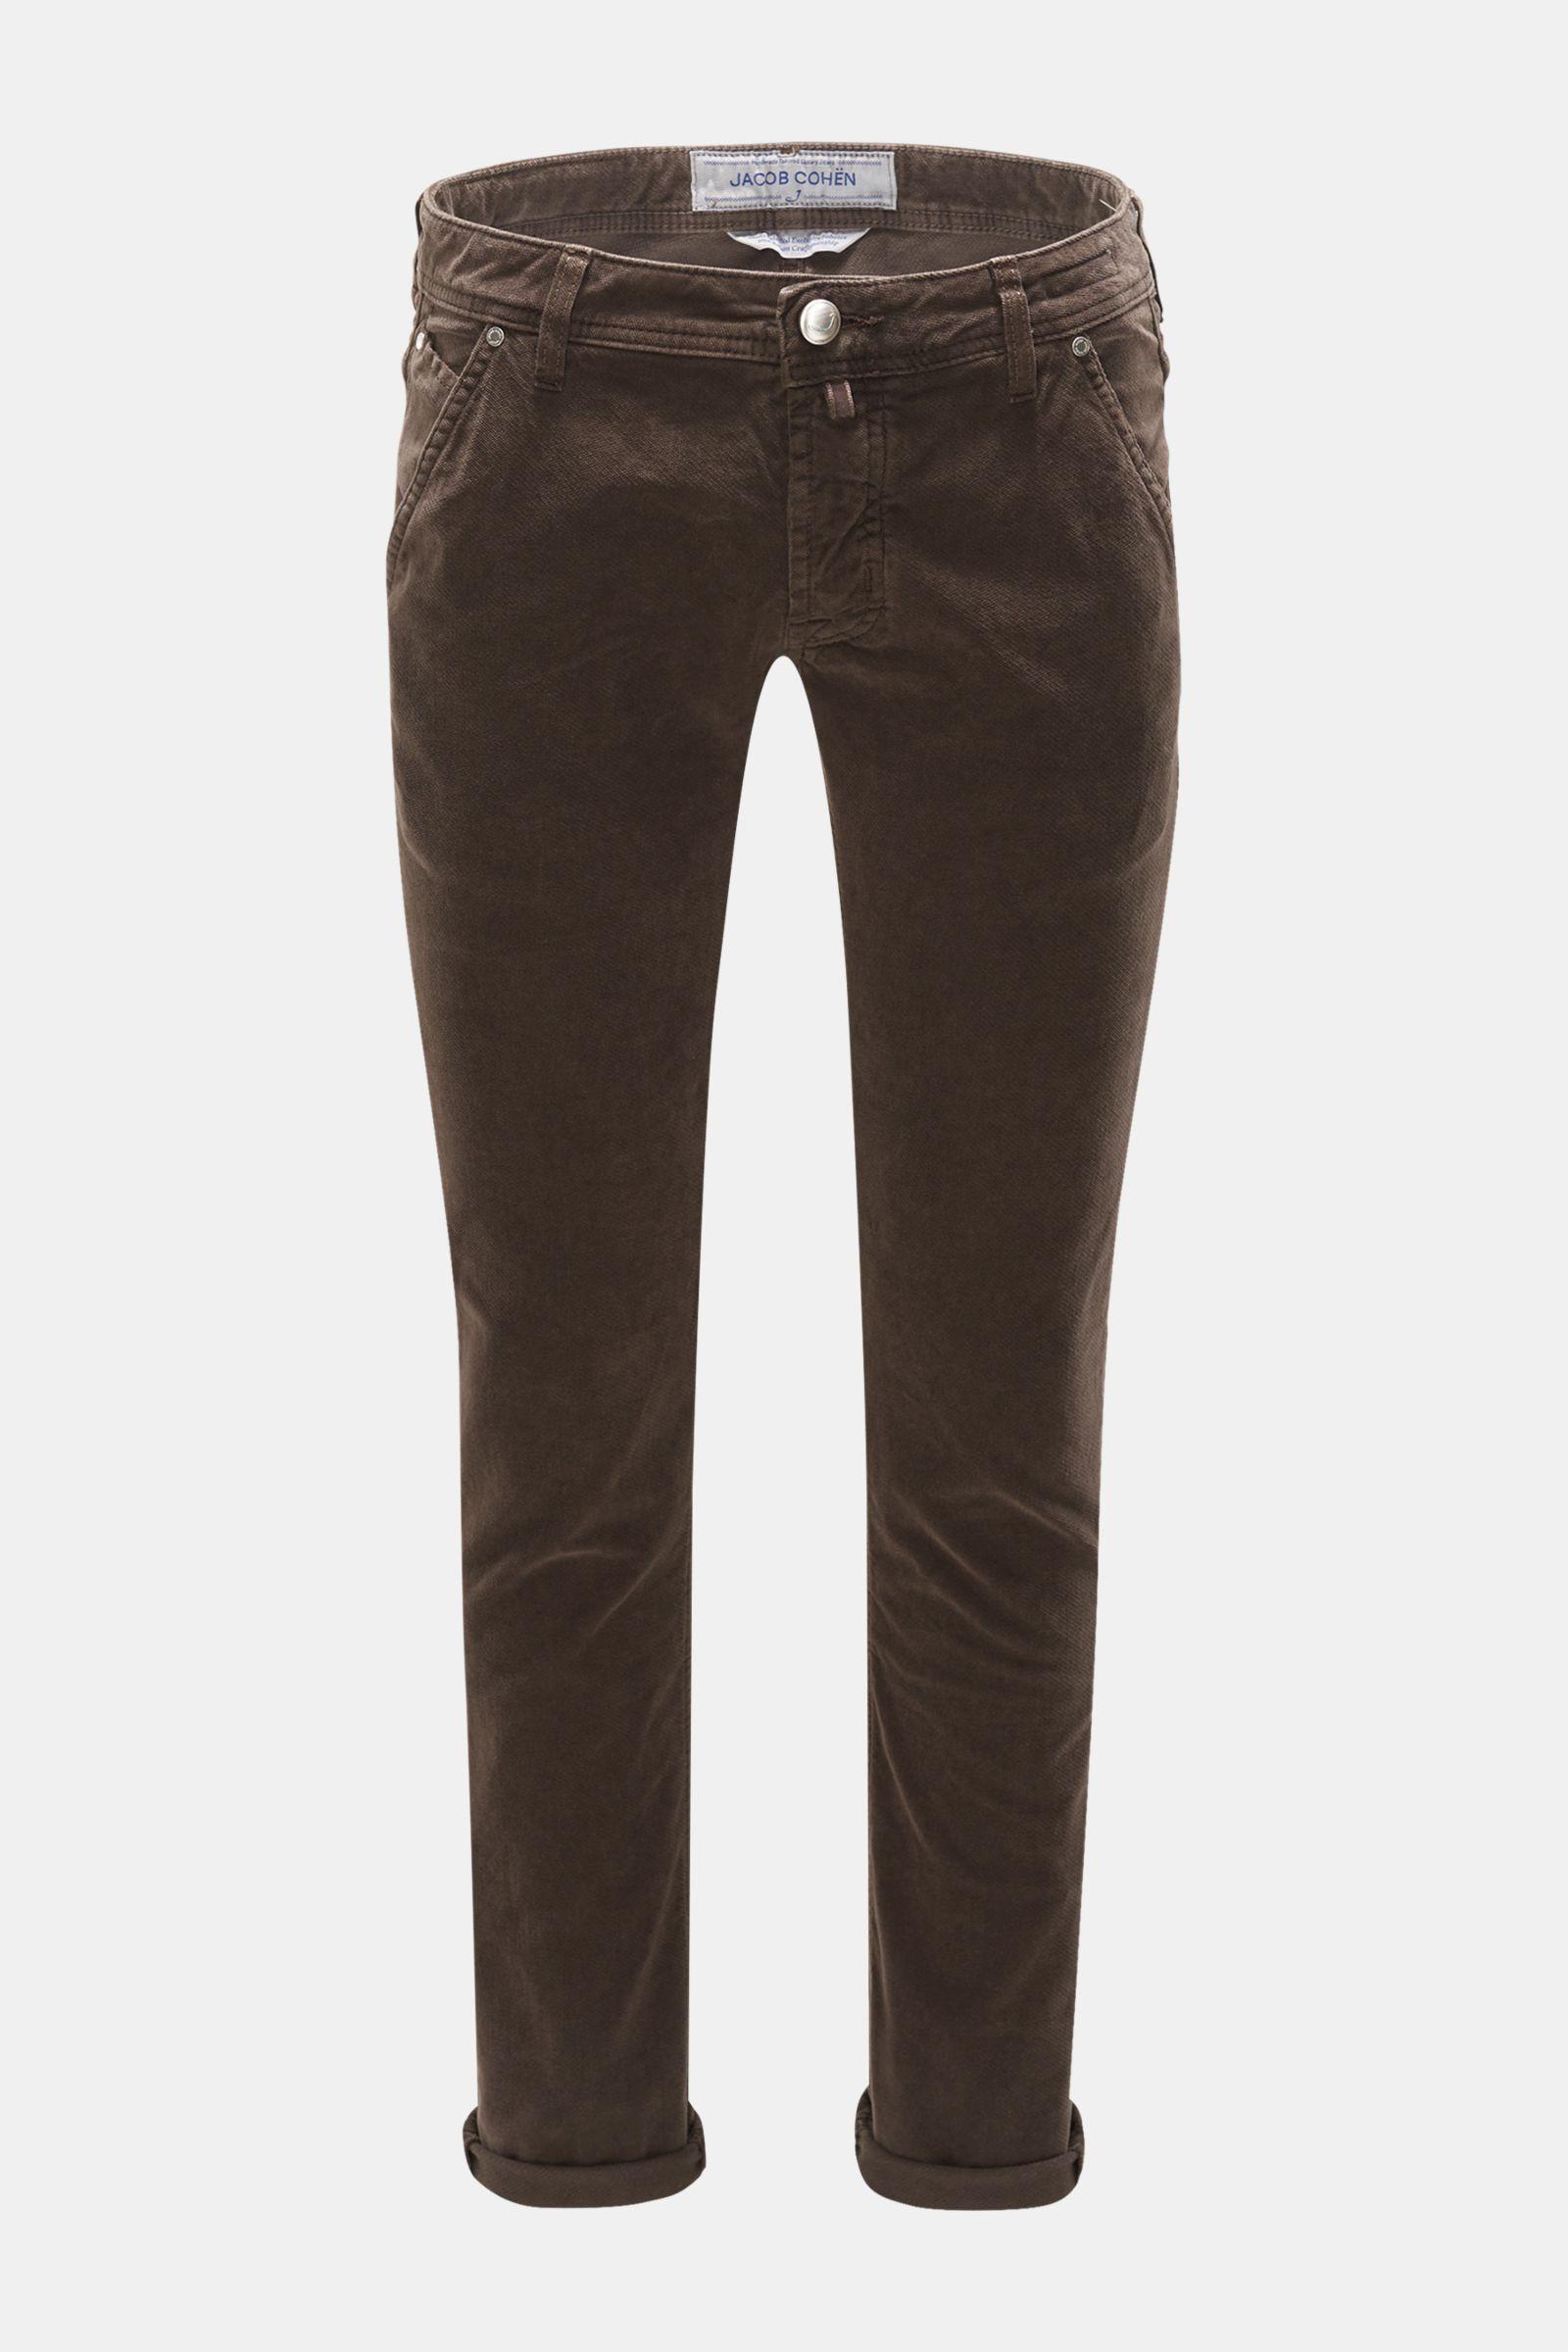 Baumwollhose 'J613 Comfort Extra Slim Fit' graubraun